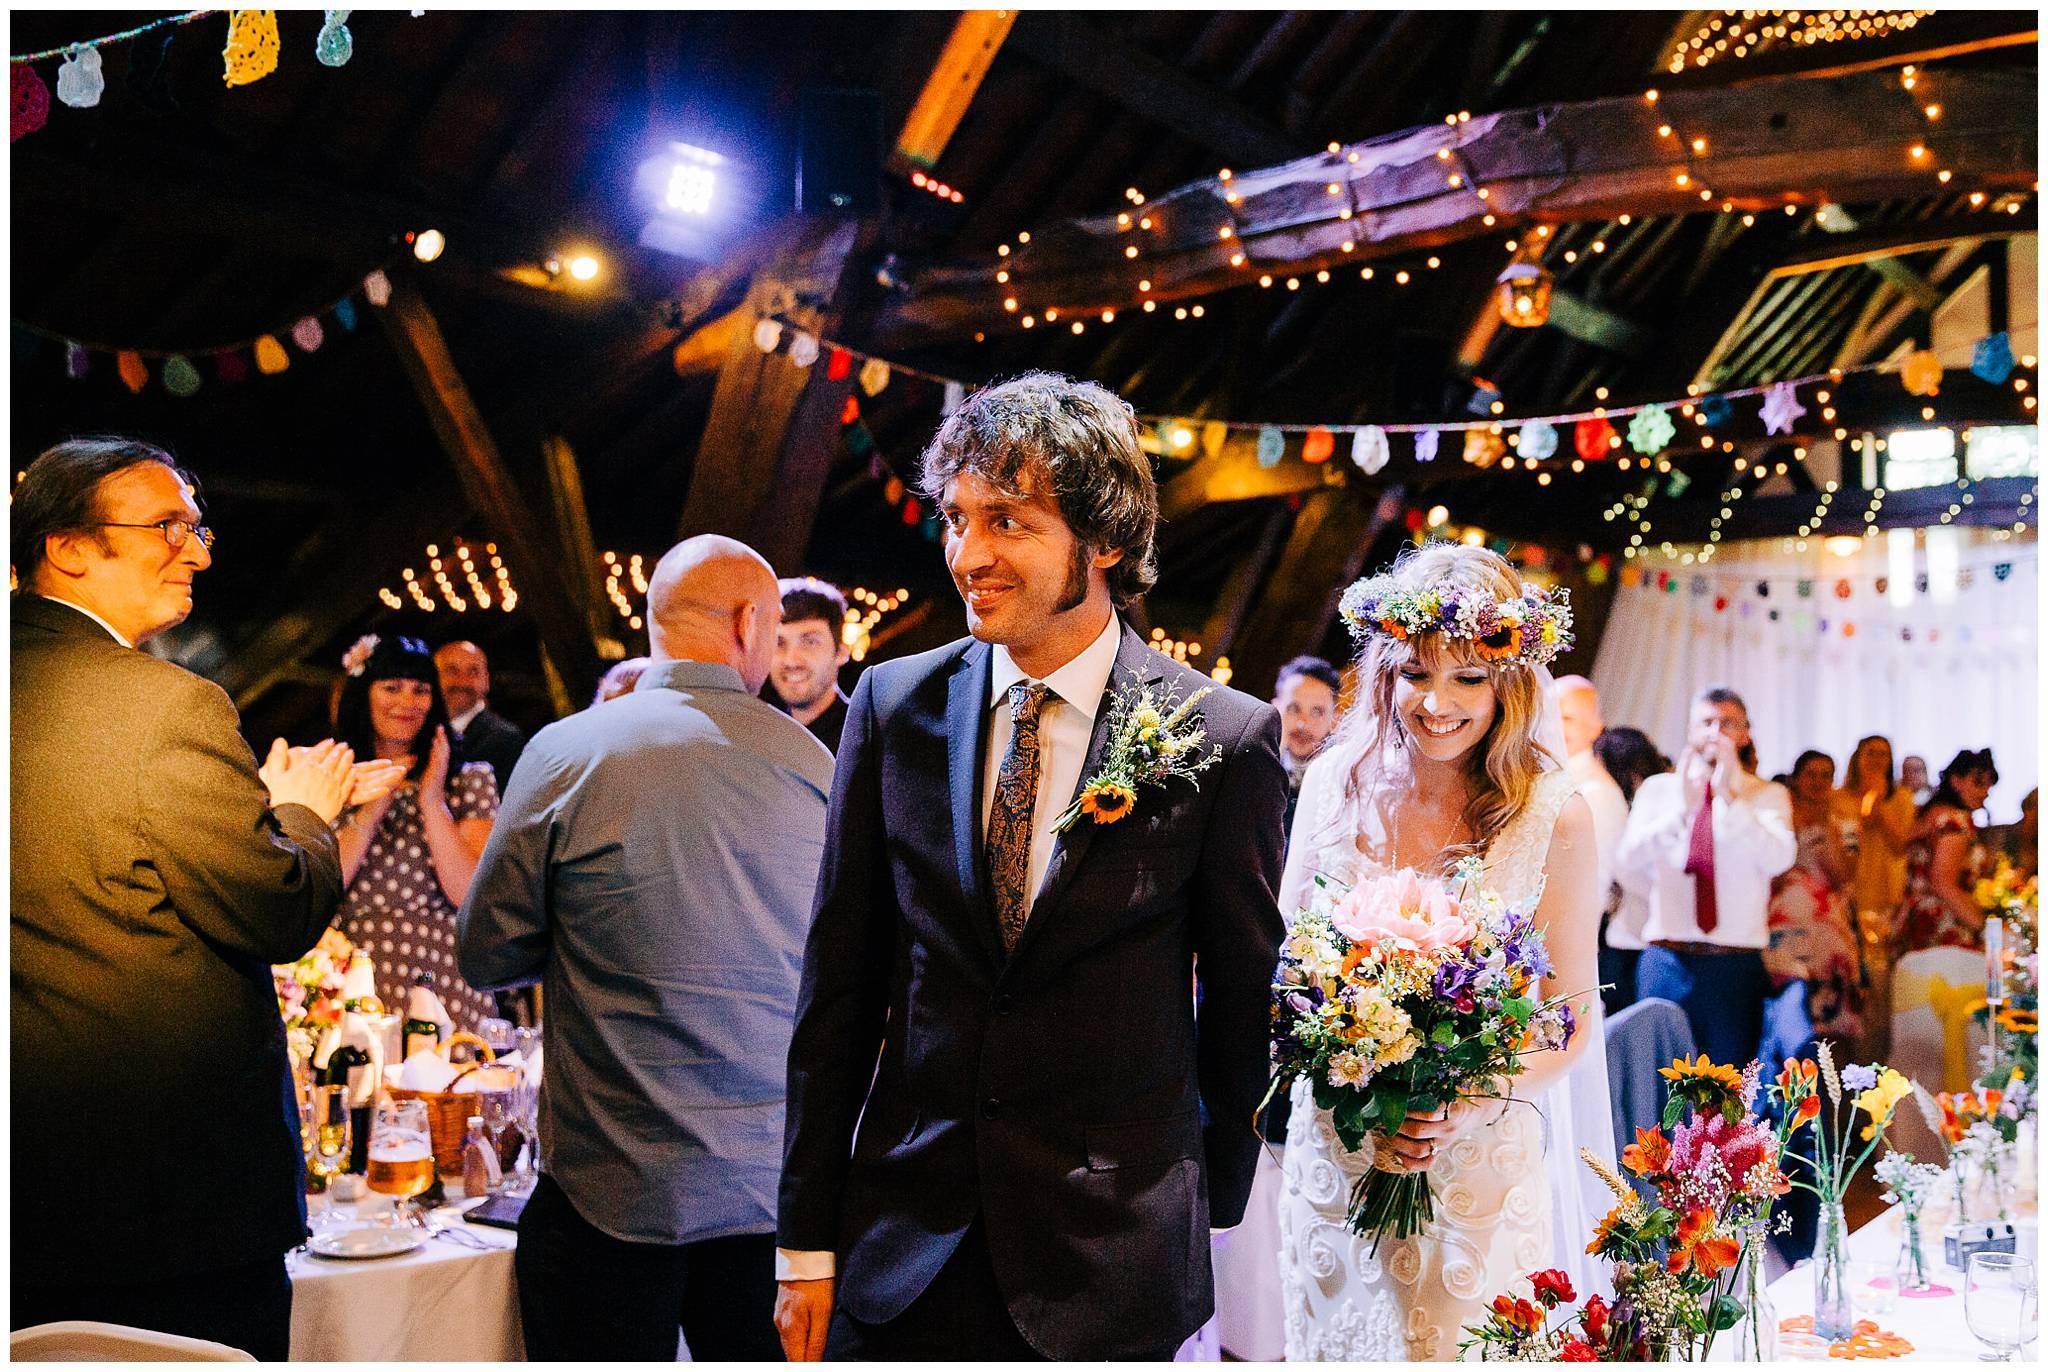 bride and groom enter wedding breakfast through guests